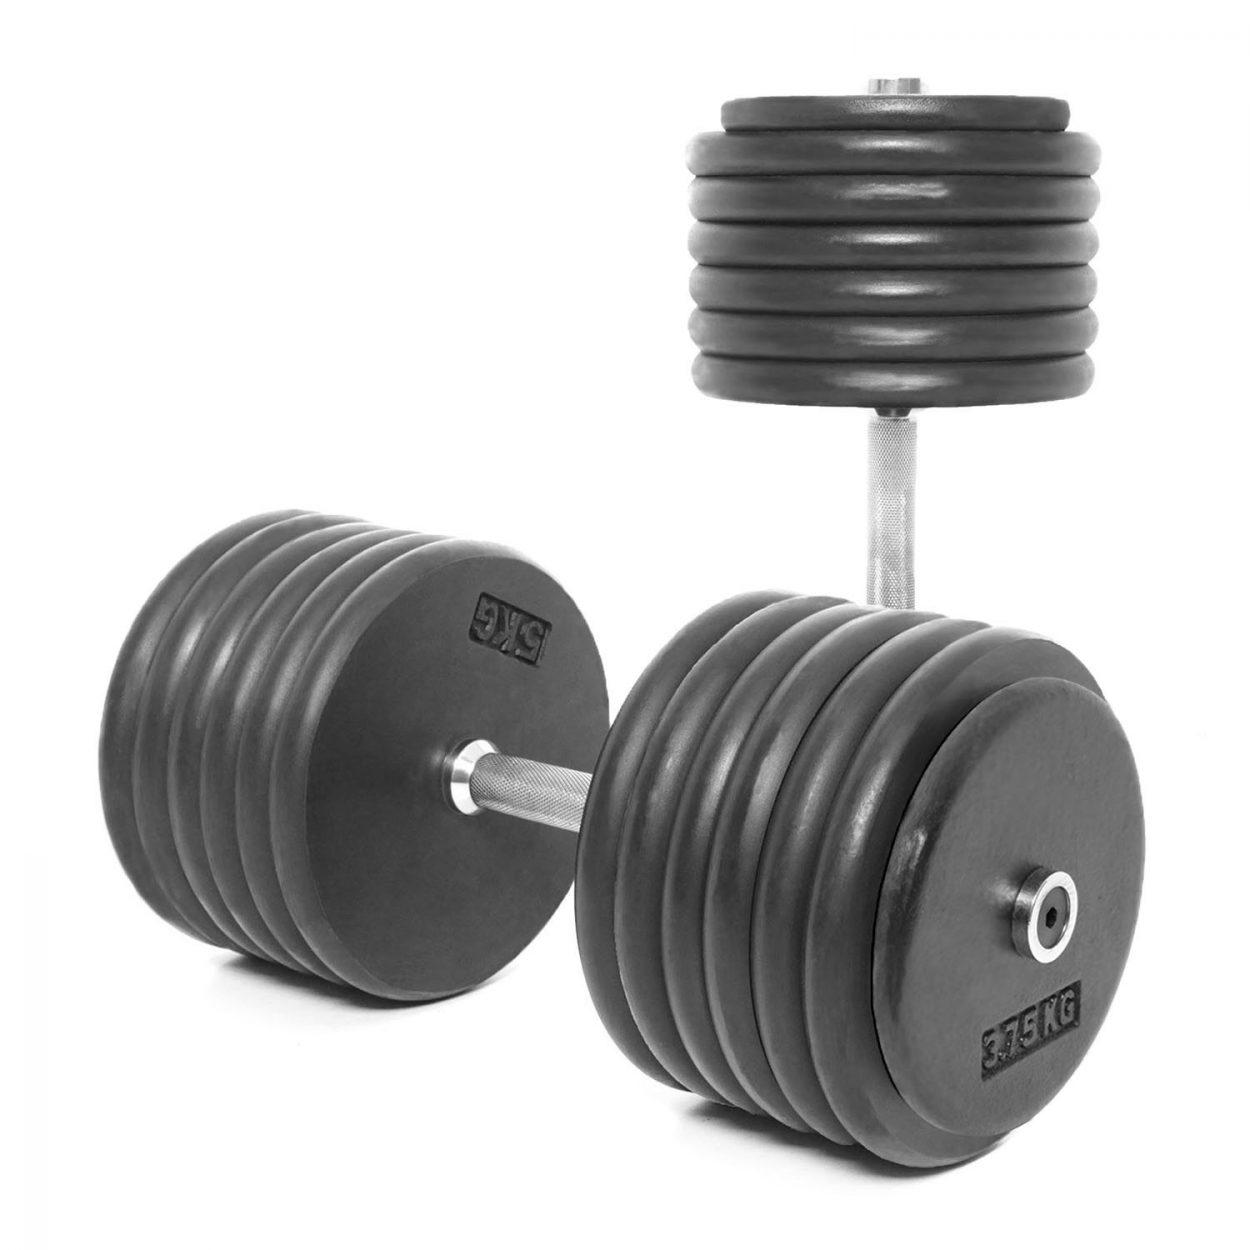 Body Power Pro-style Dumbbells